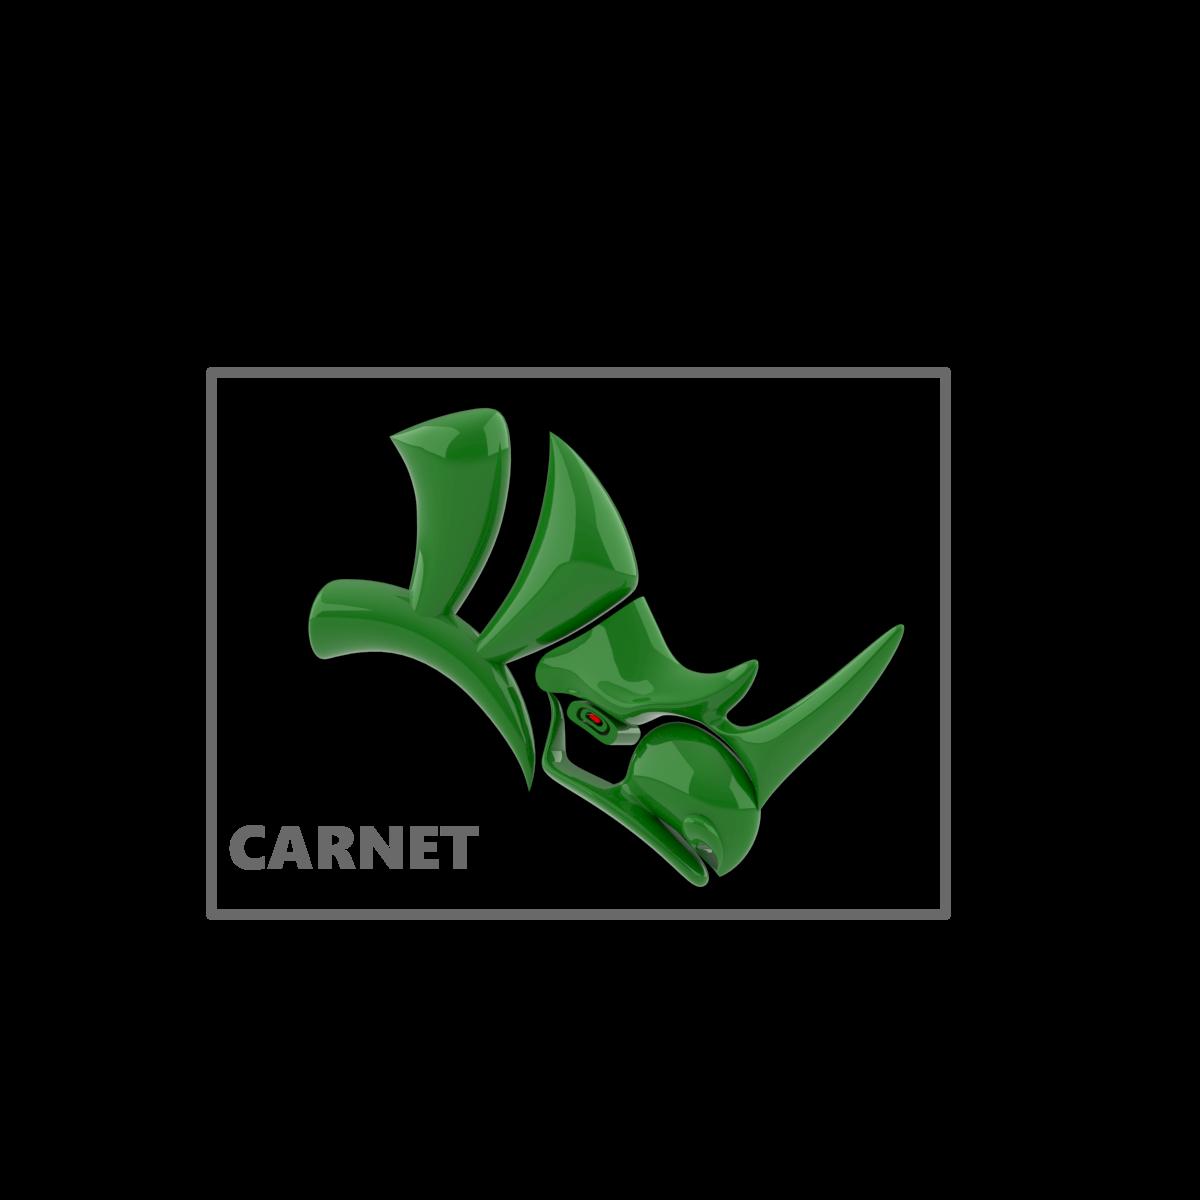 CARNET_Online